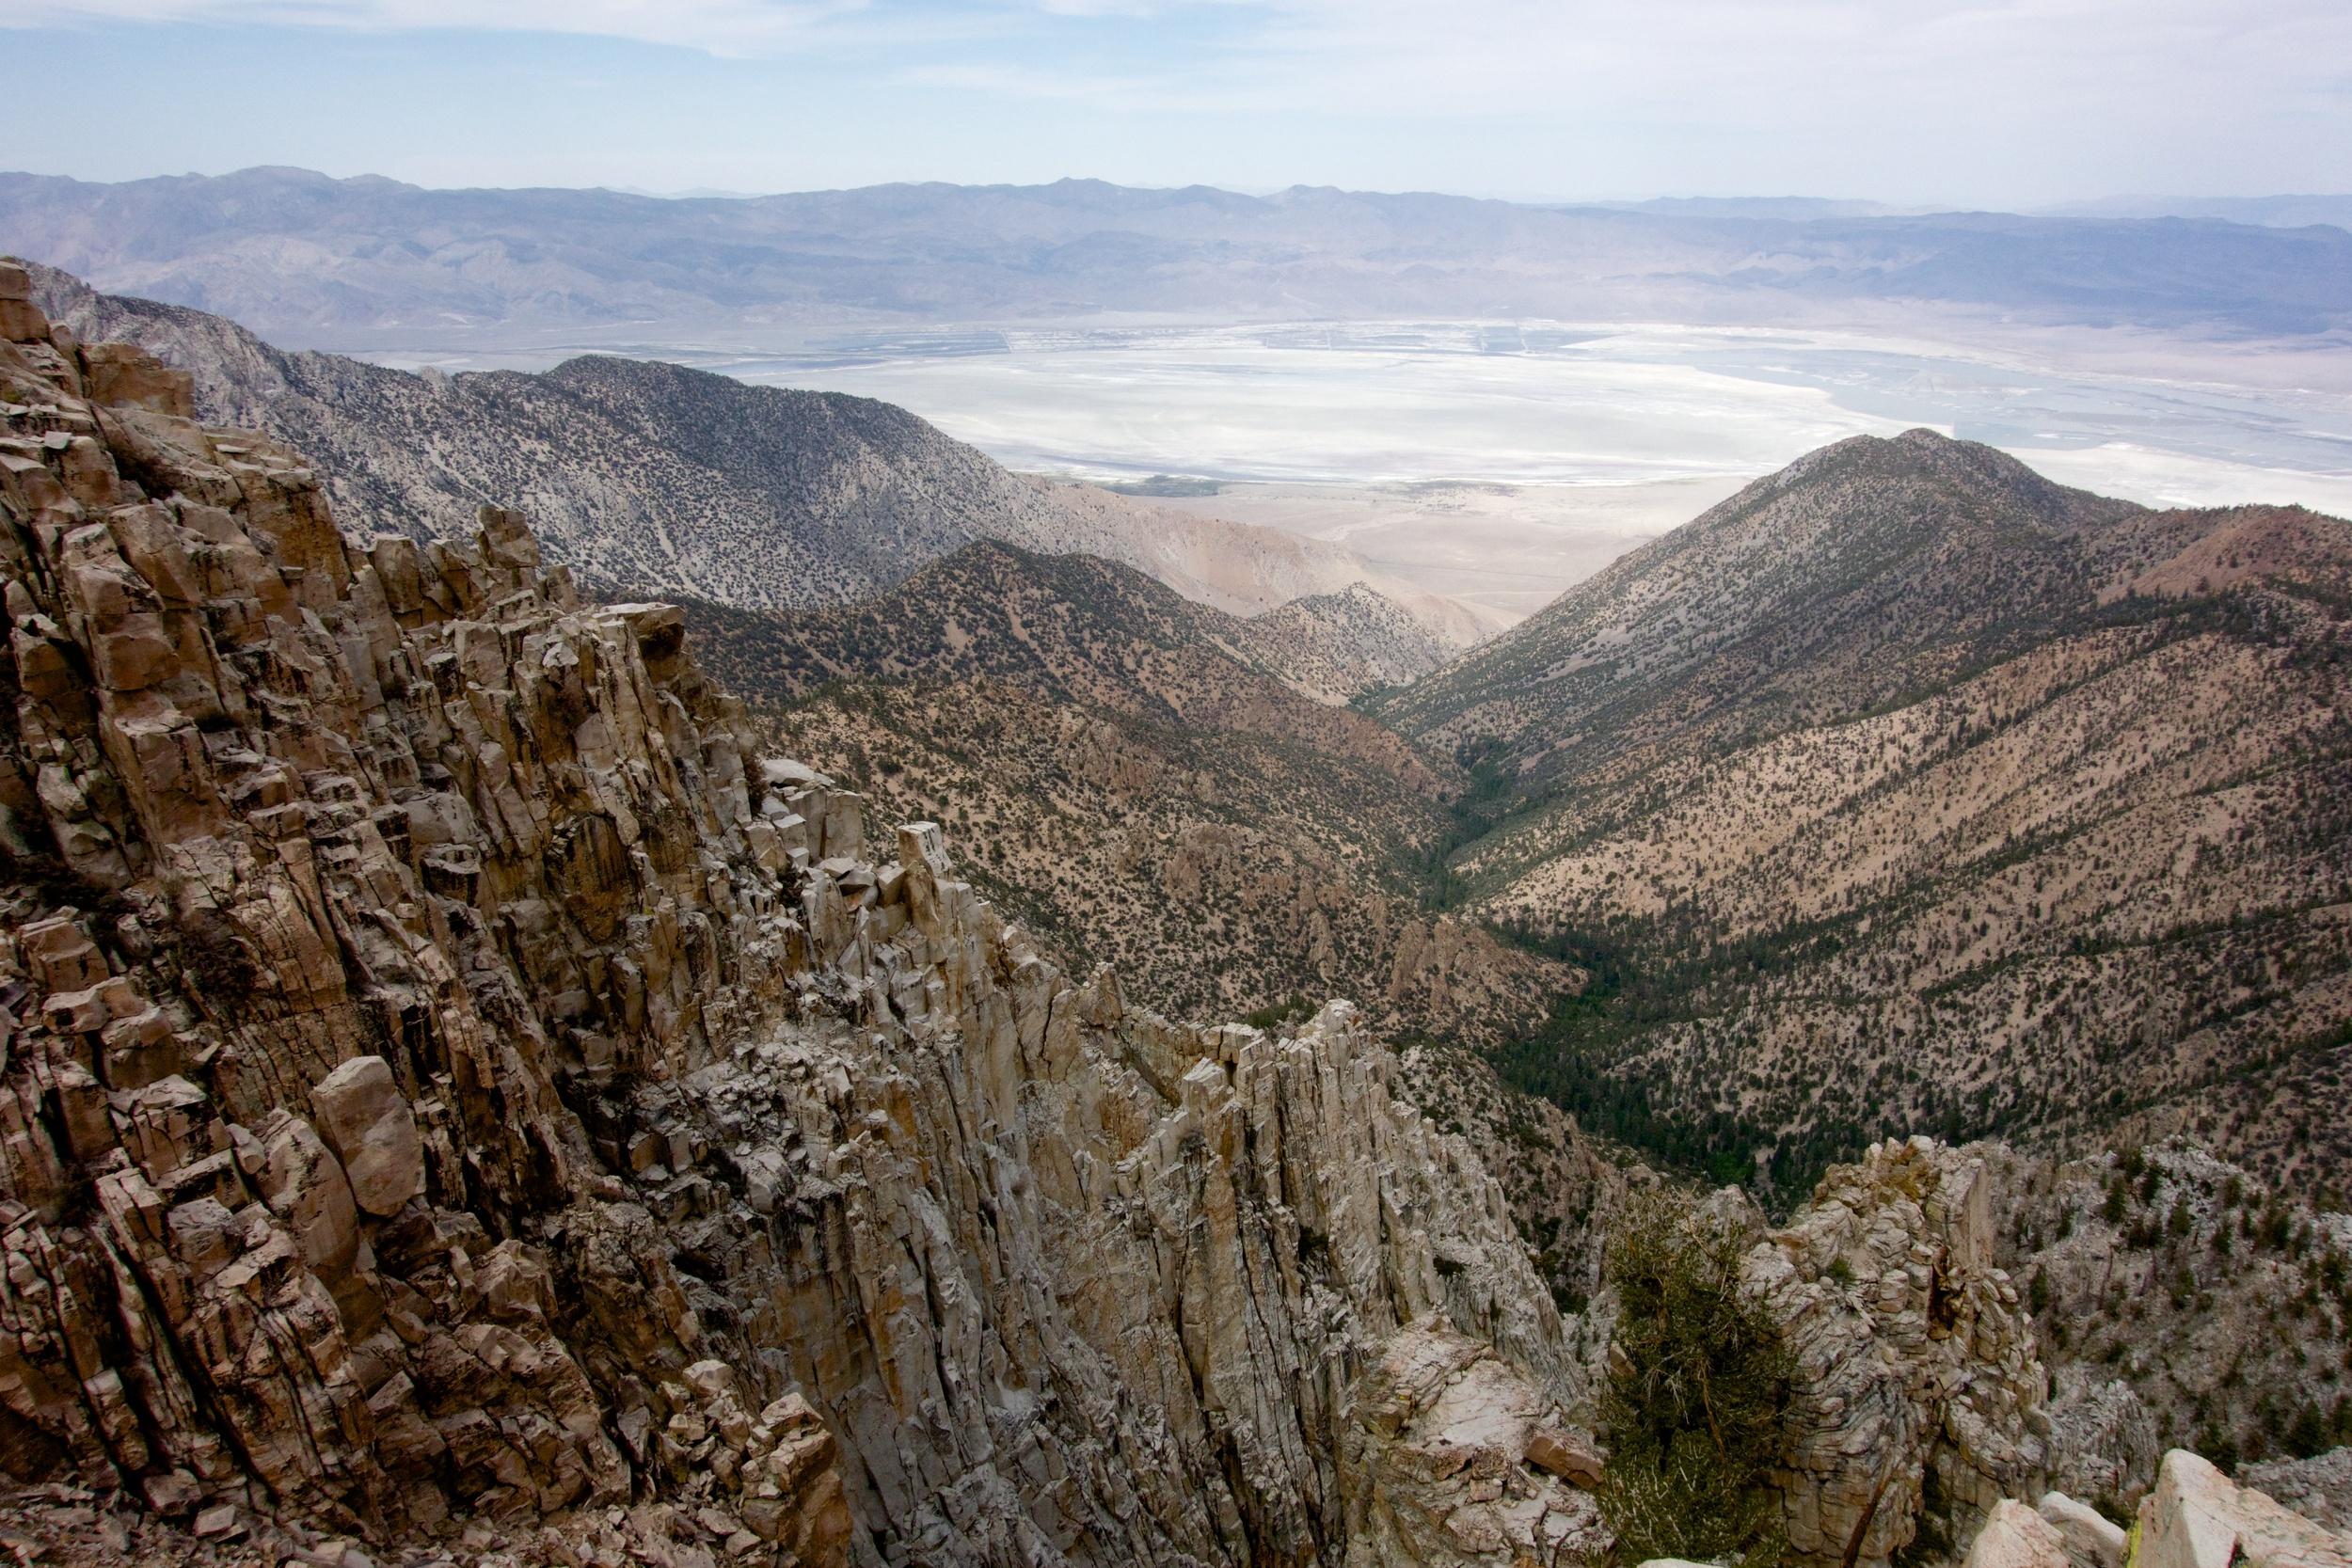 Edge of the Sierra